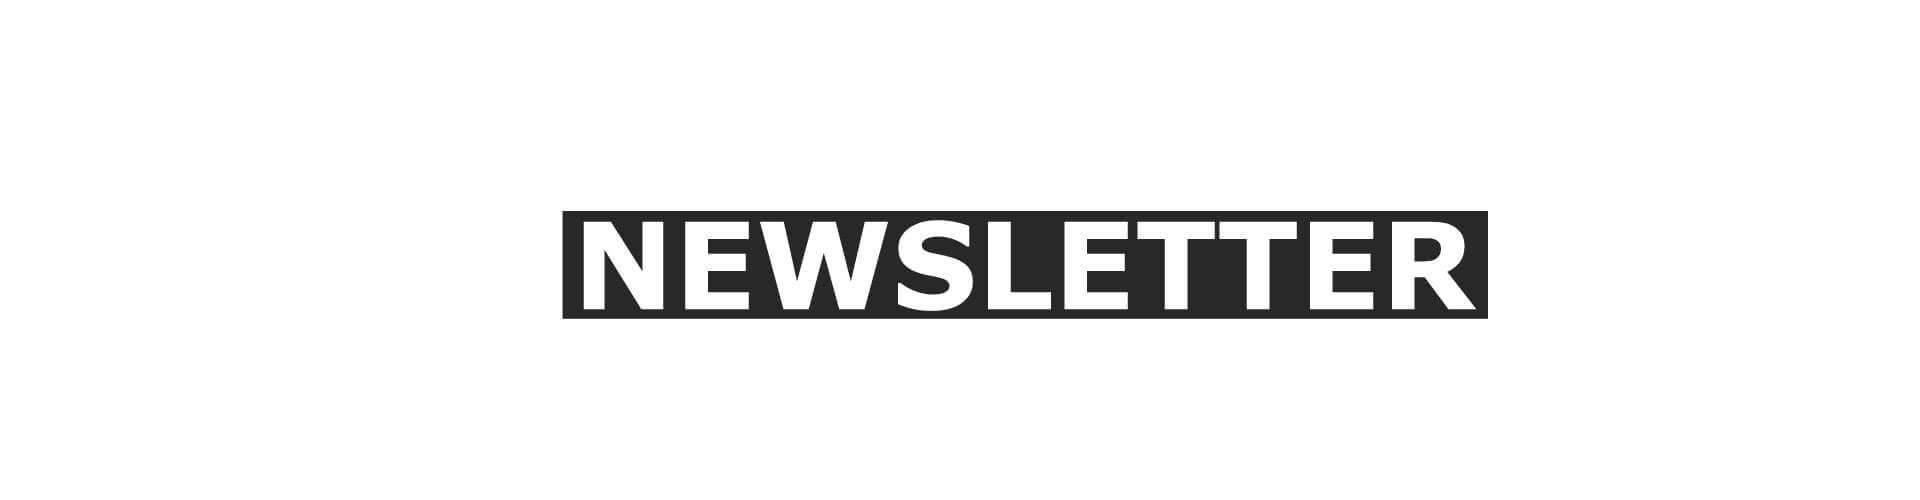 NEWSLETTER - Anmeldung